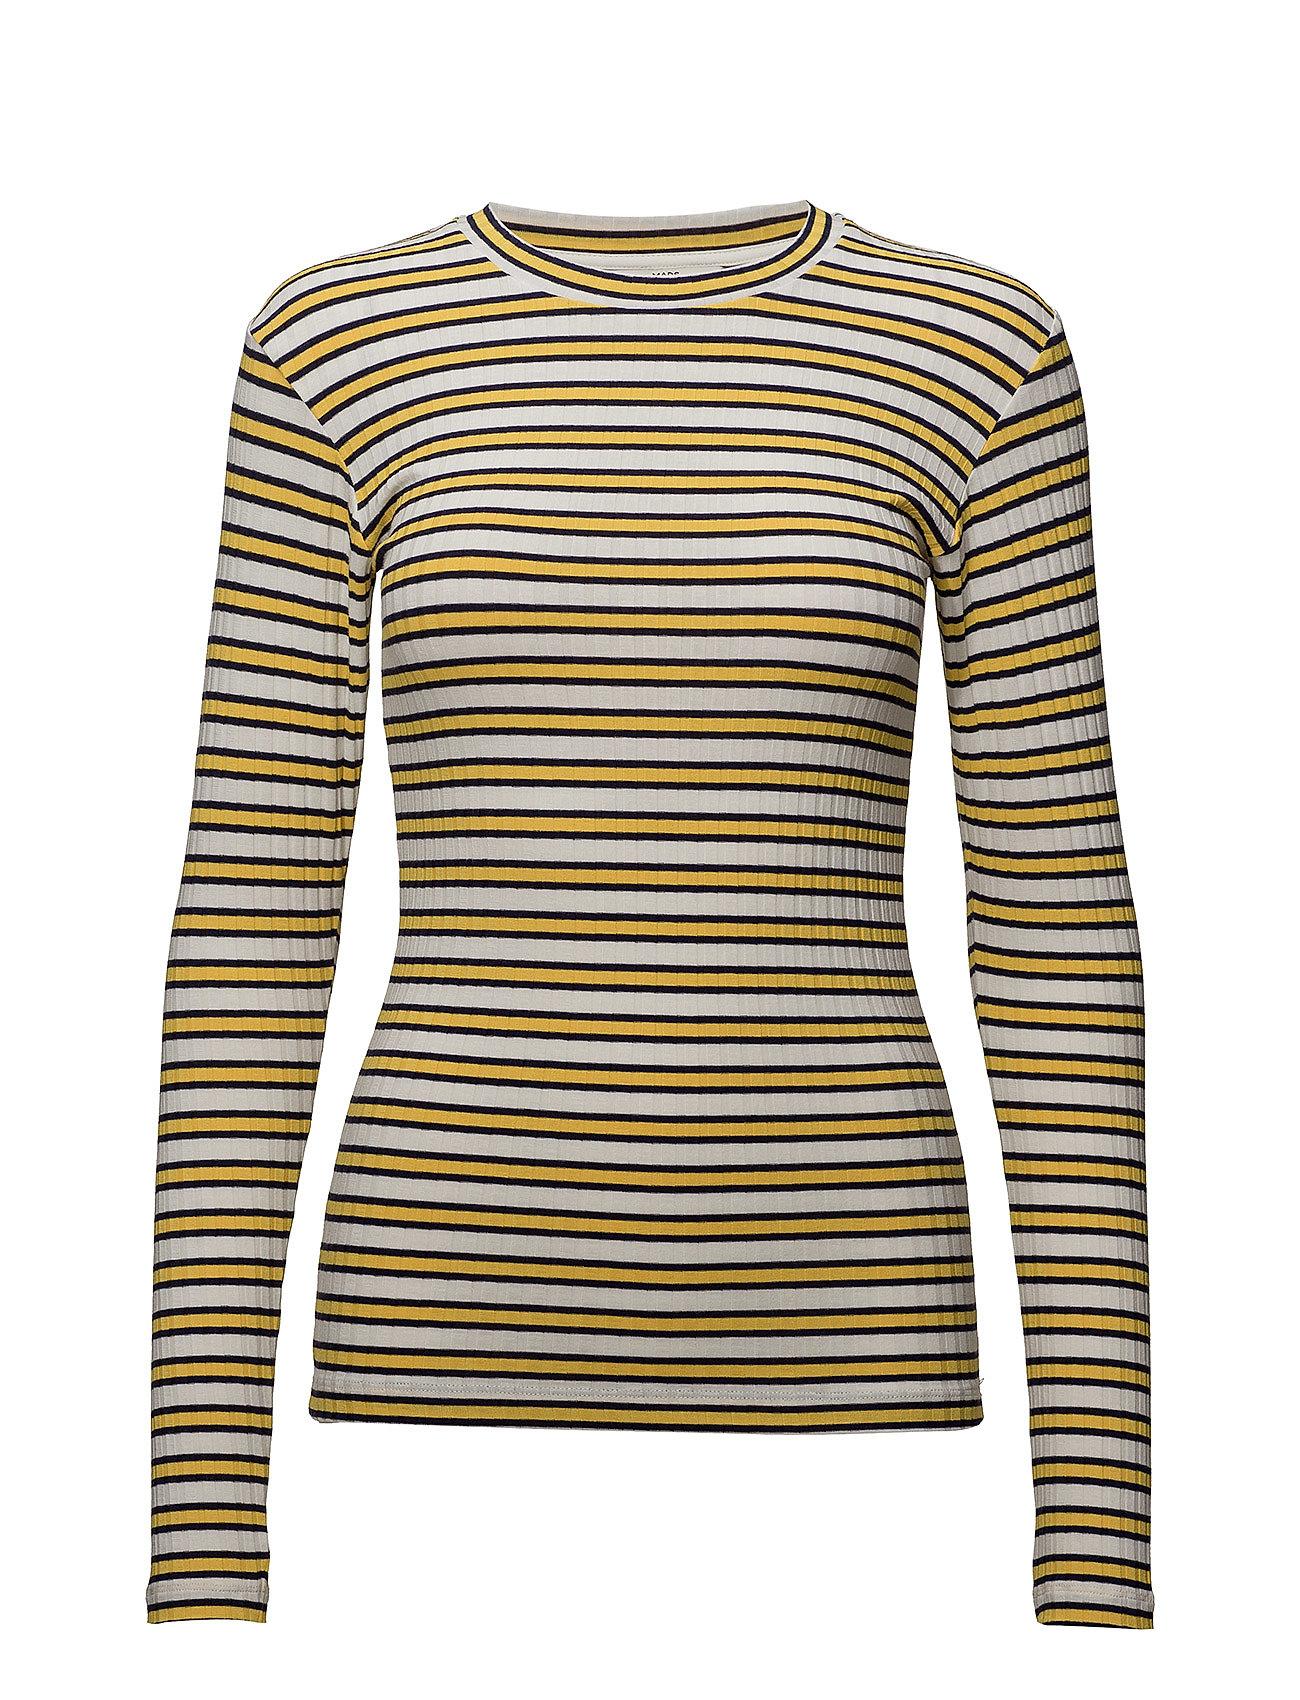 5x5 Stripe Stripe Tuba S Langærmet T shirt Multimønstret MADS NØRGAARD